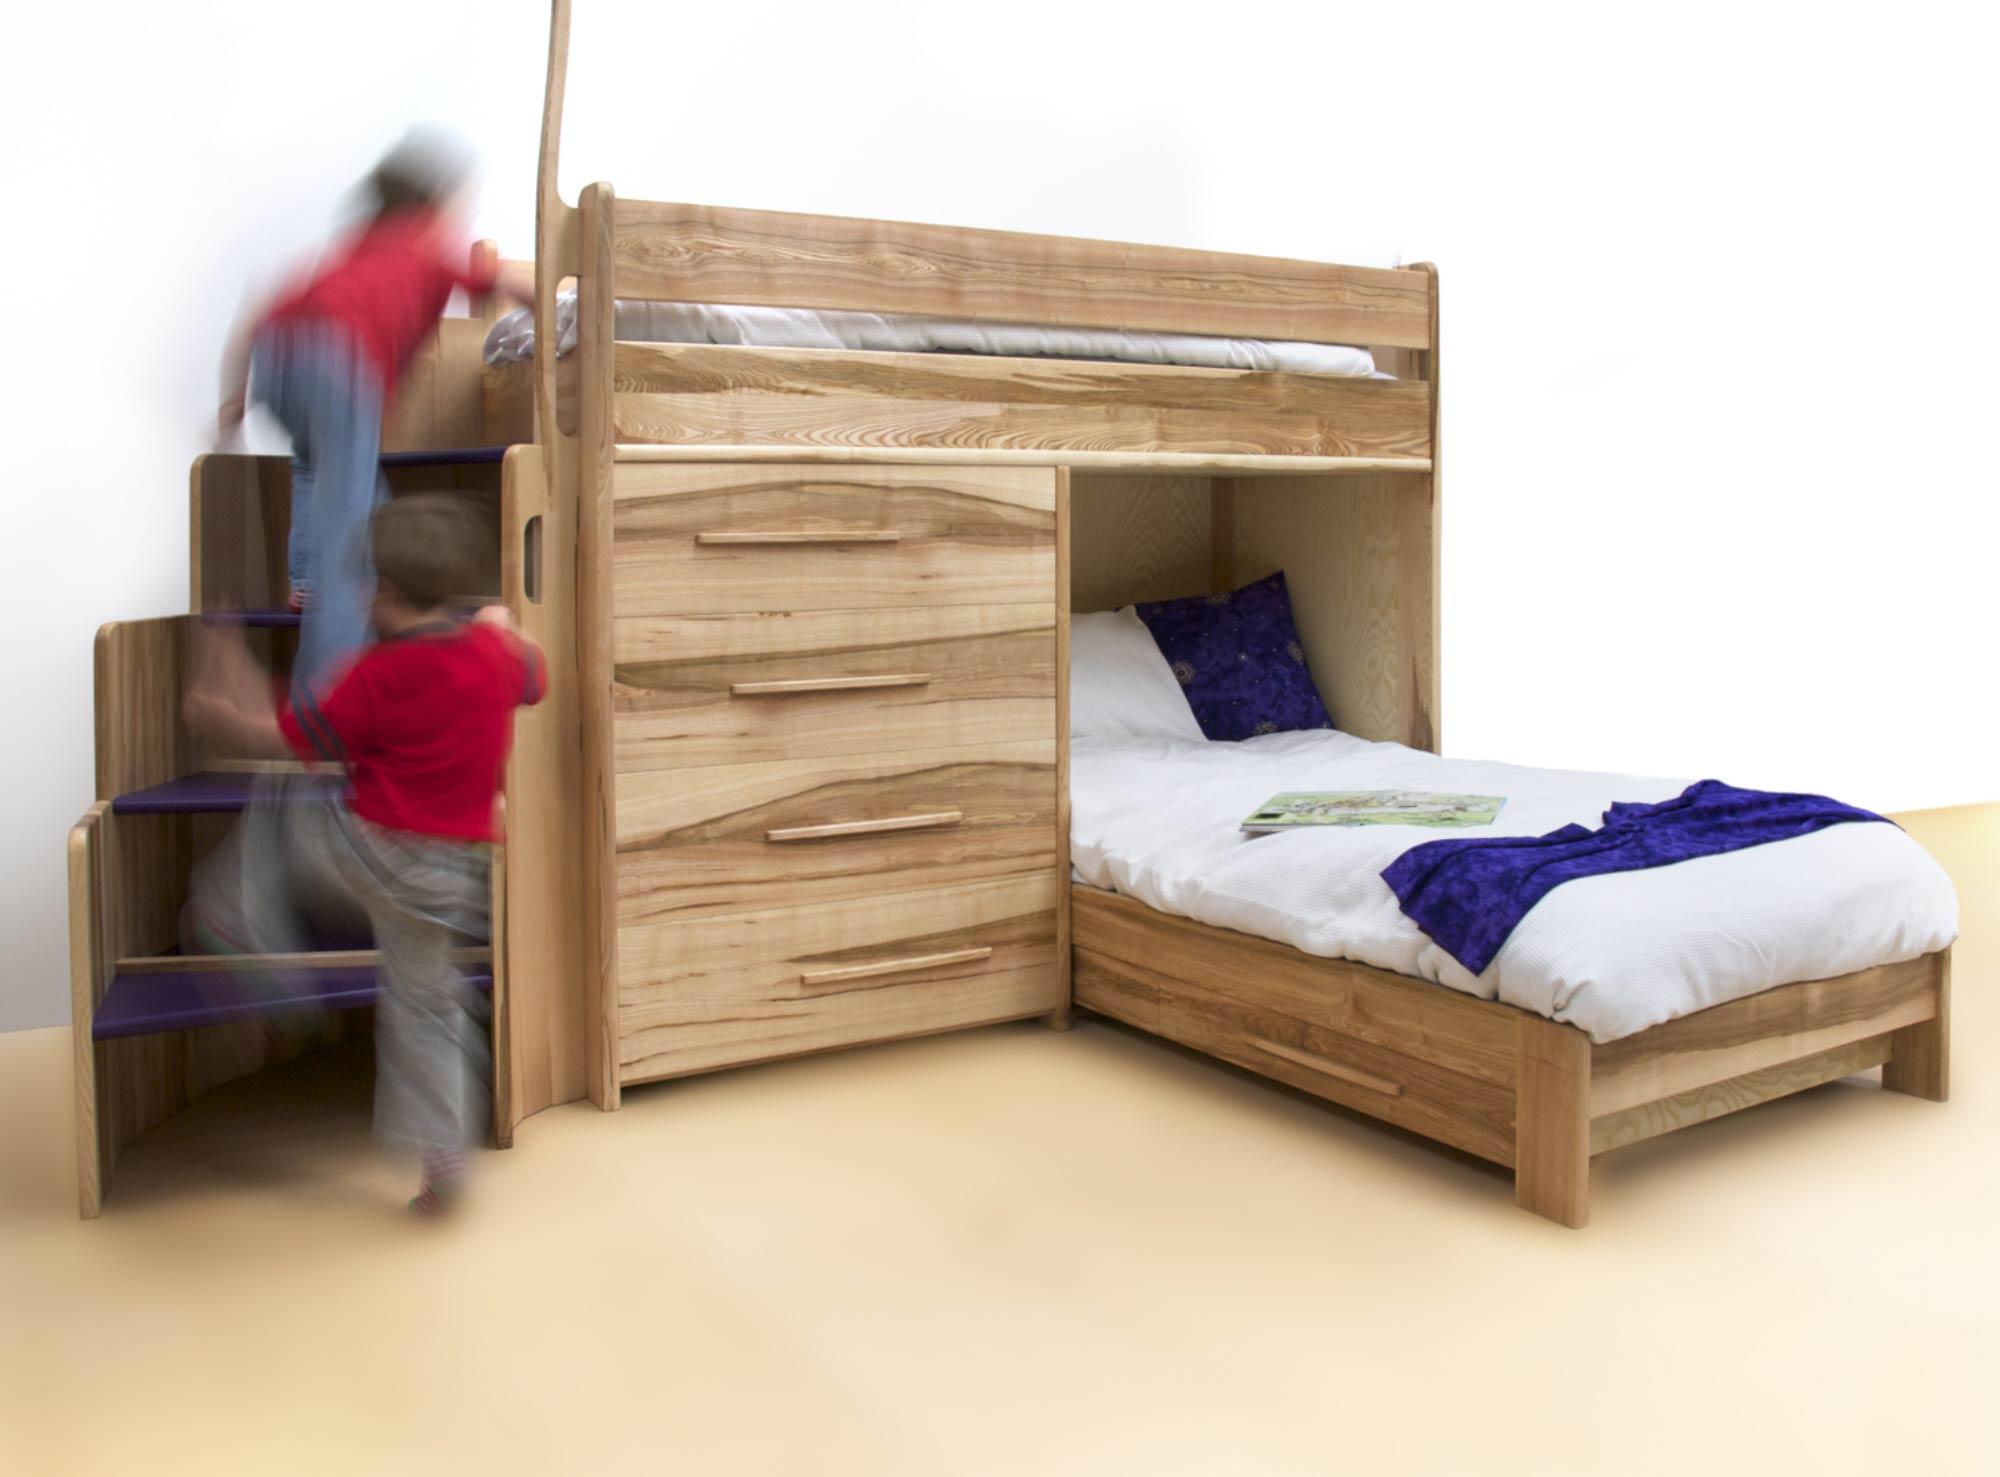 Bespoke Bunk Beds In Ash By Furniture Designer Daniel